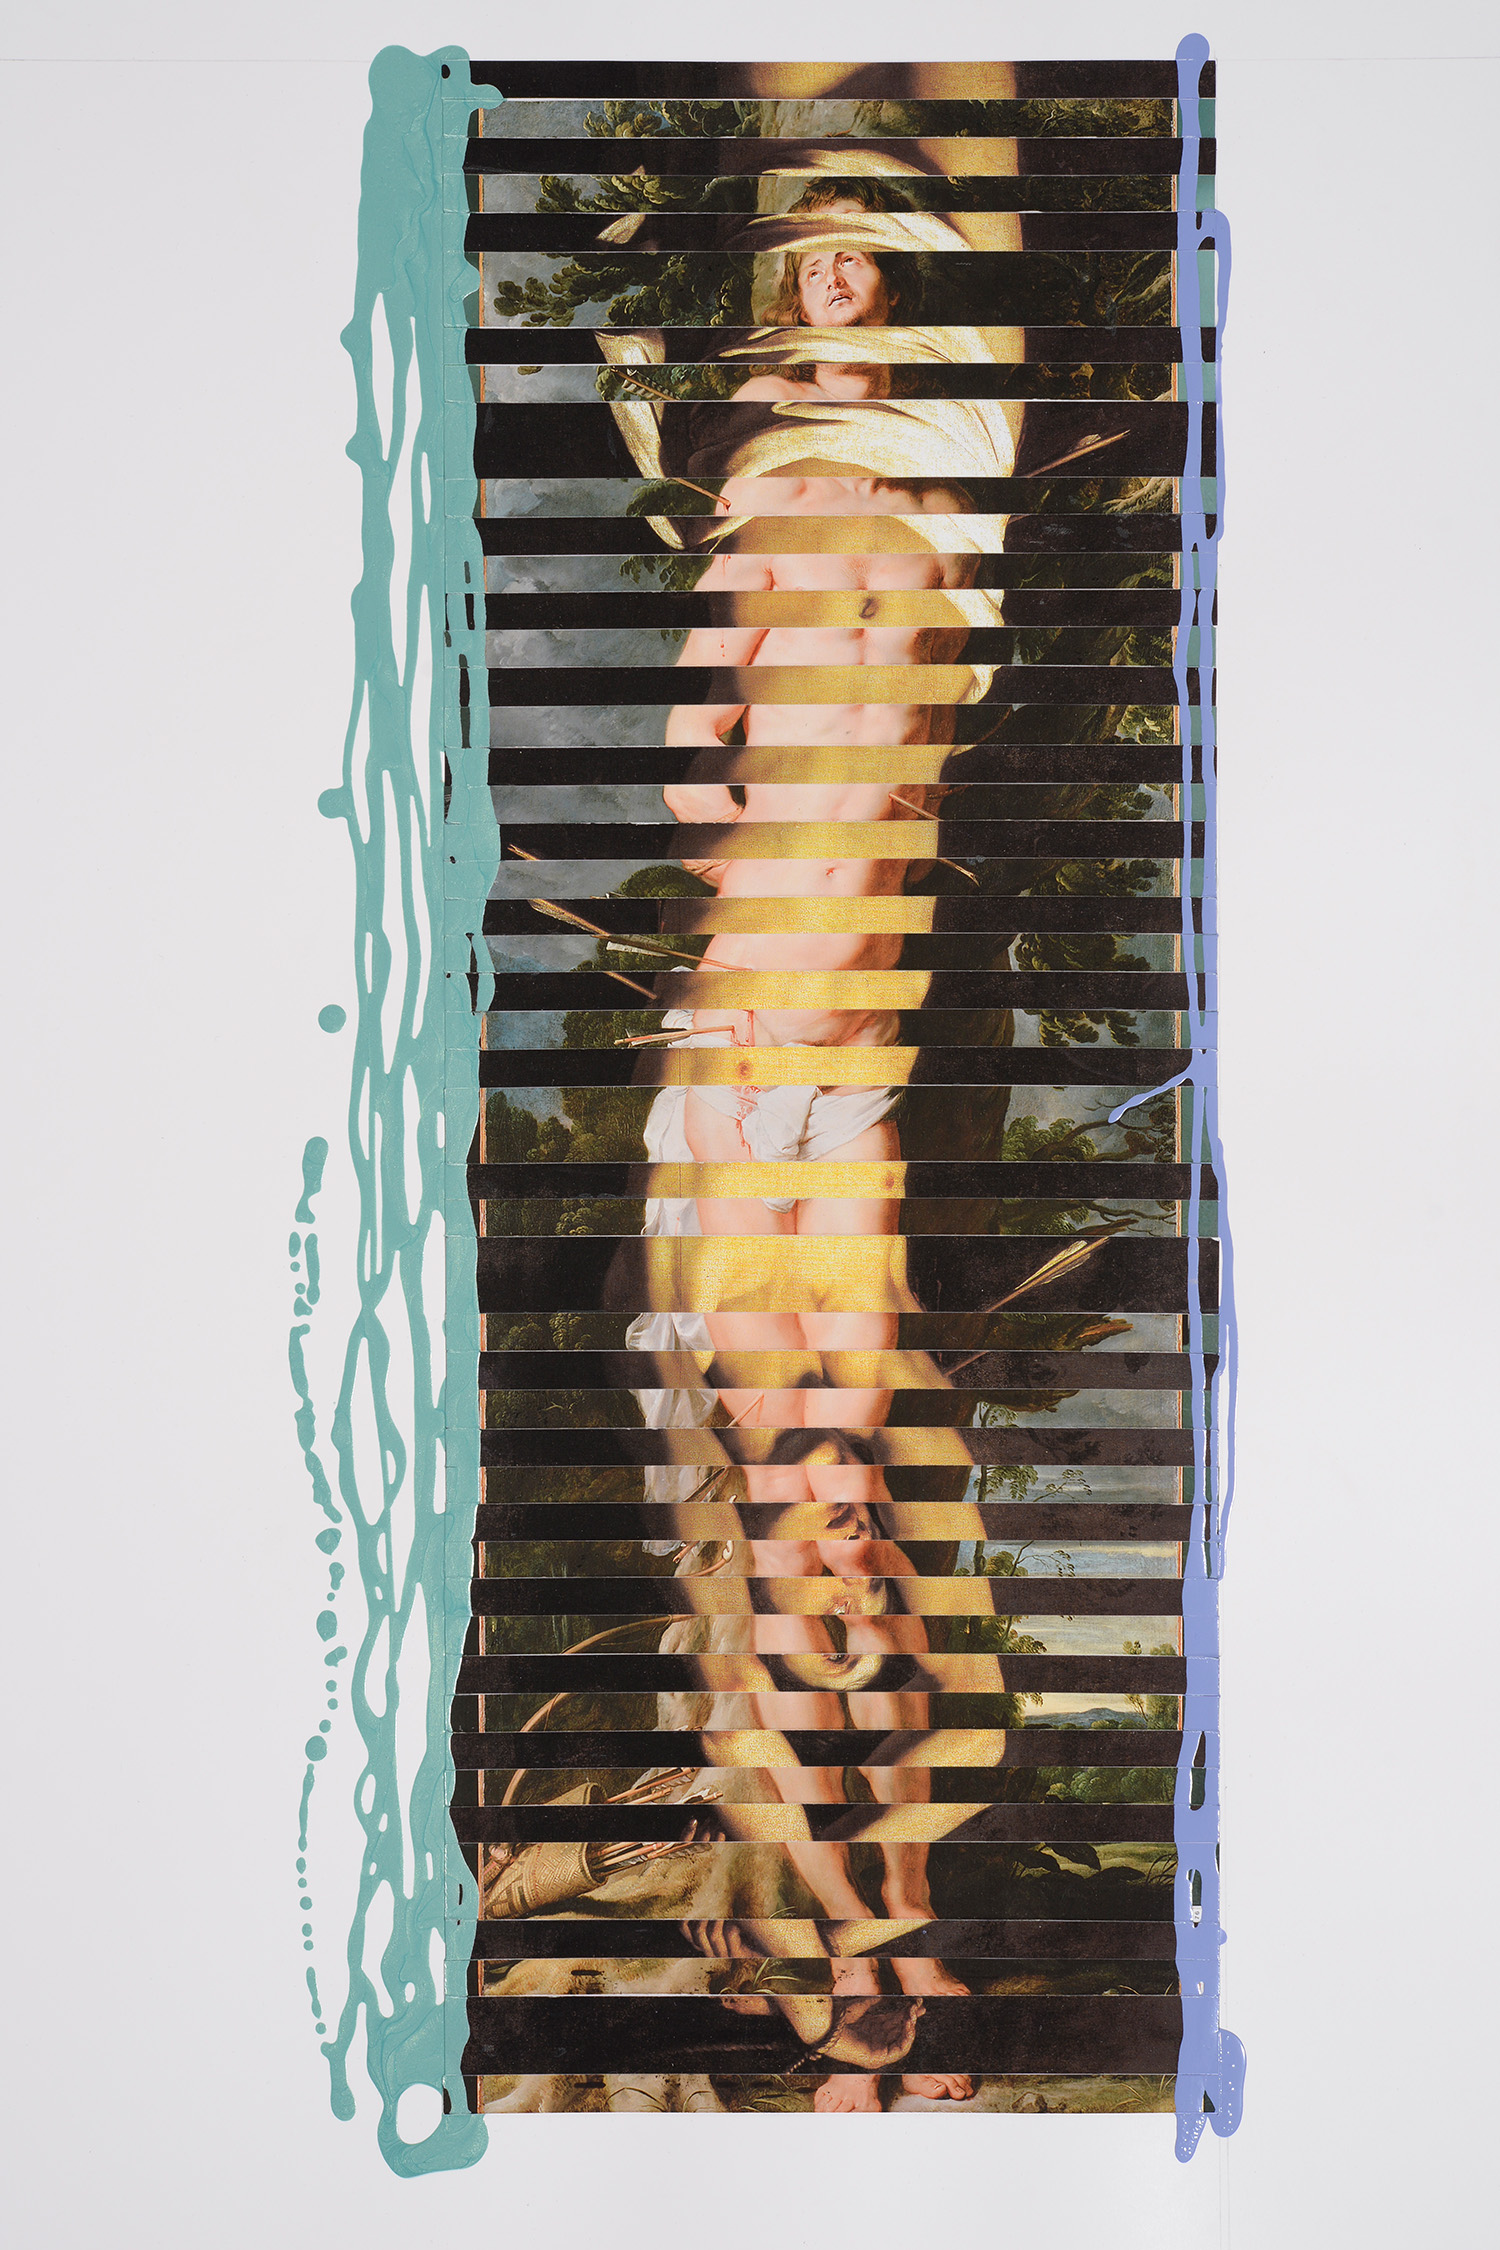 Markues, Charming, 2013, mixed media on paper, 60 x 40 cm.jpg